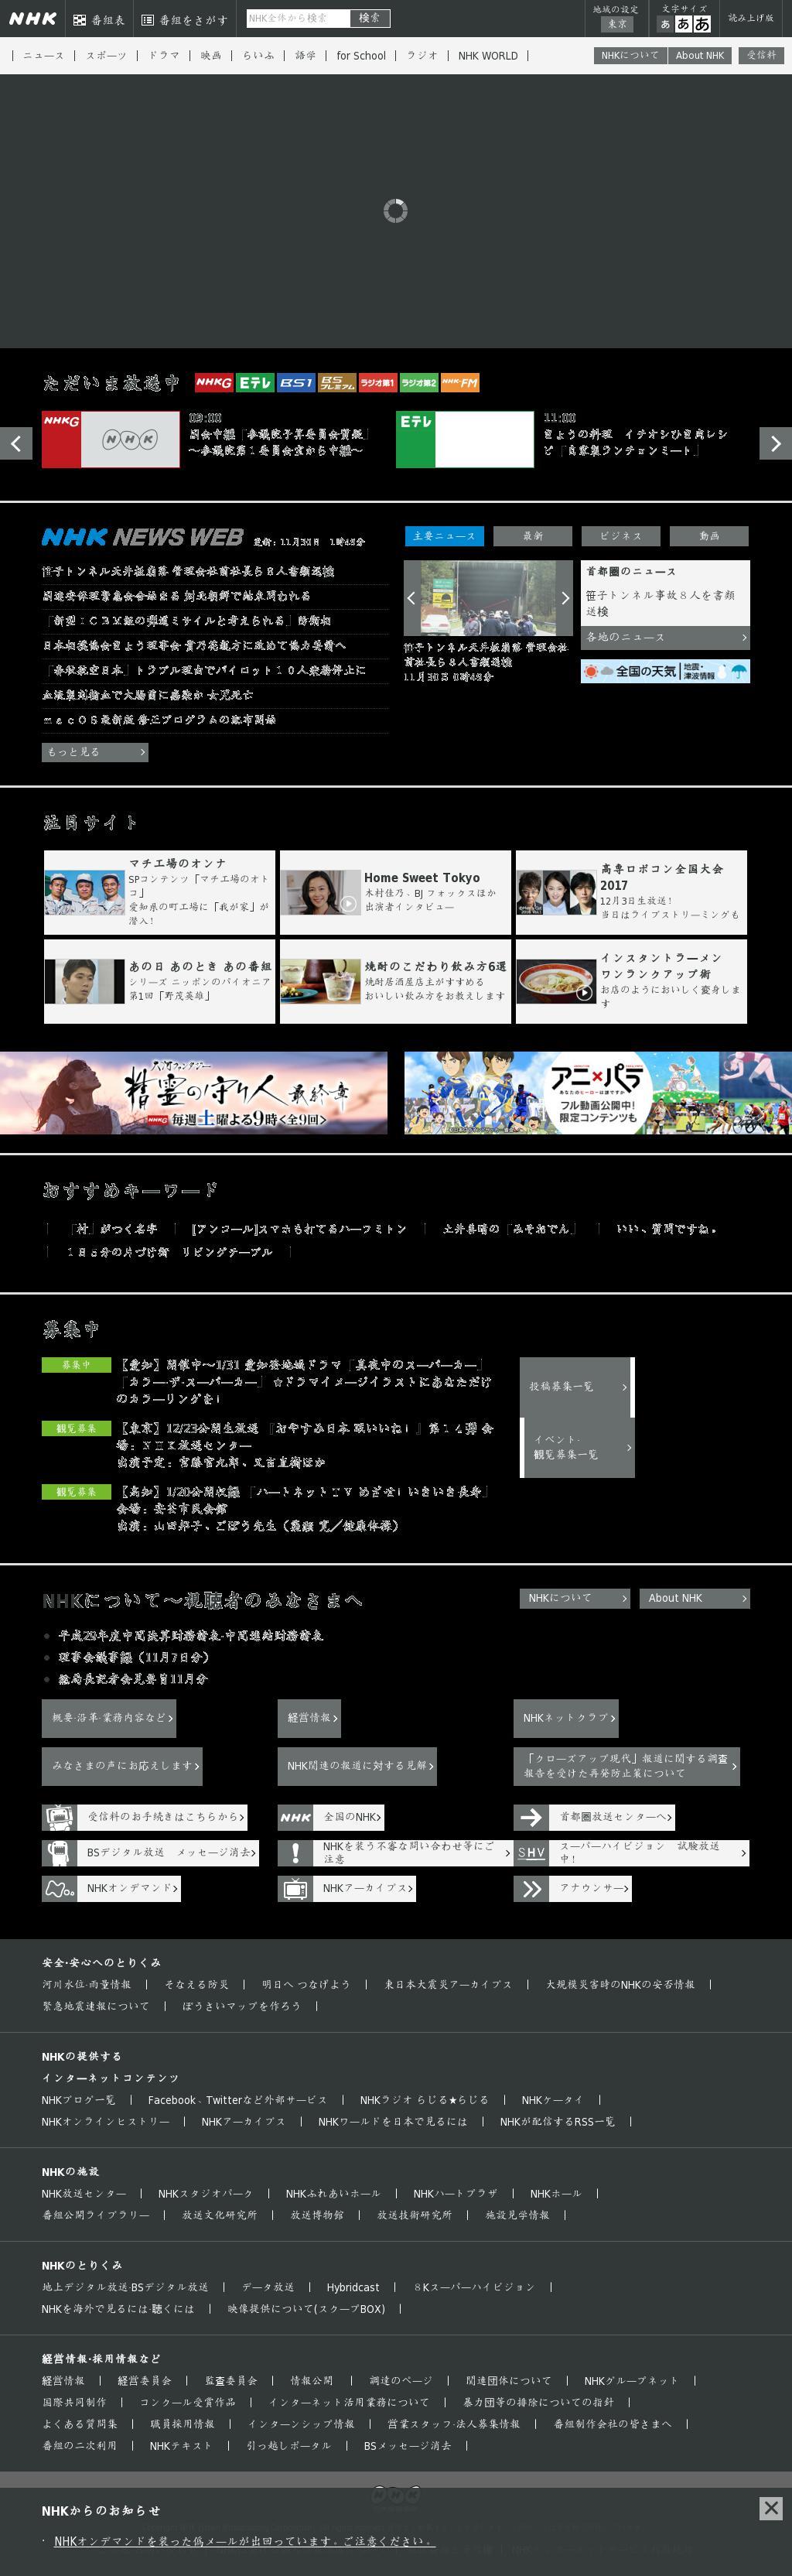 NHK Online at Friday Jan. 5, 2018, 2:08 a.m. UTC